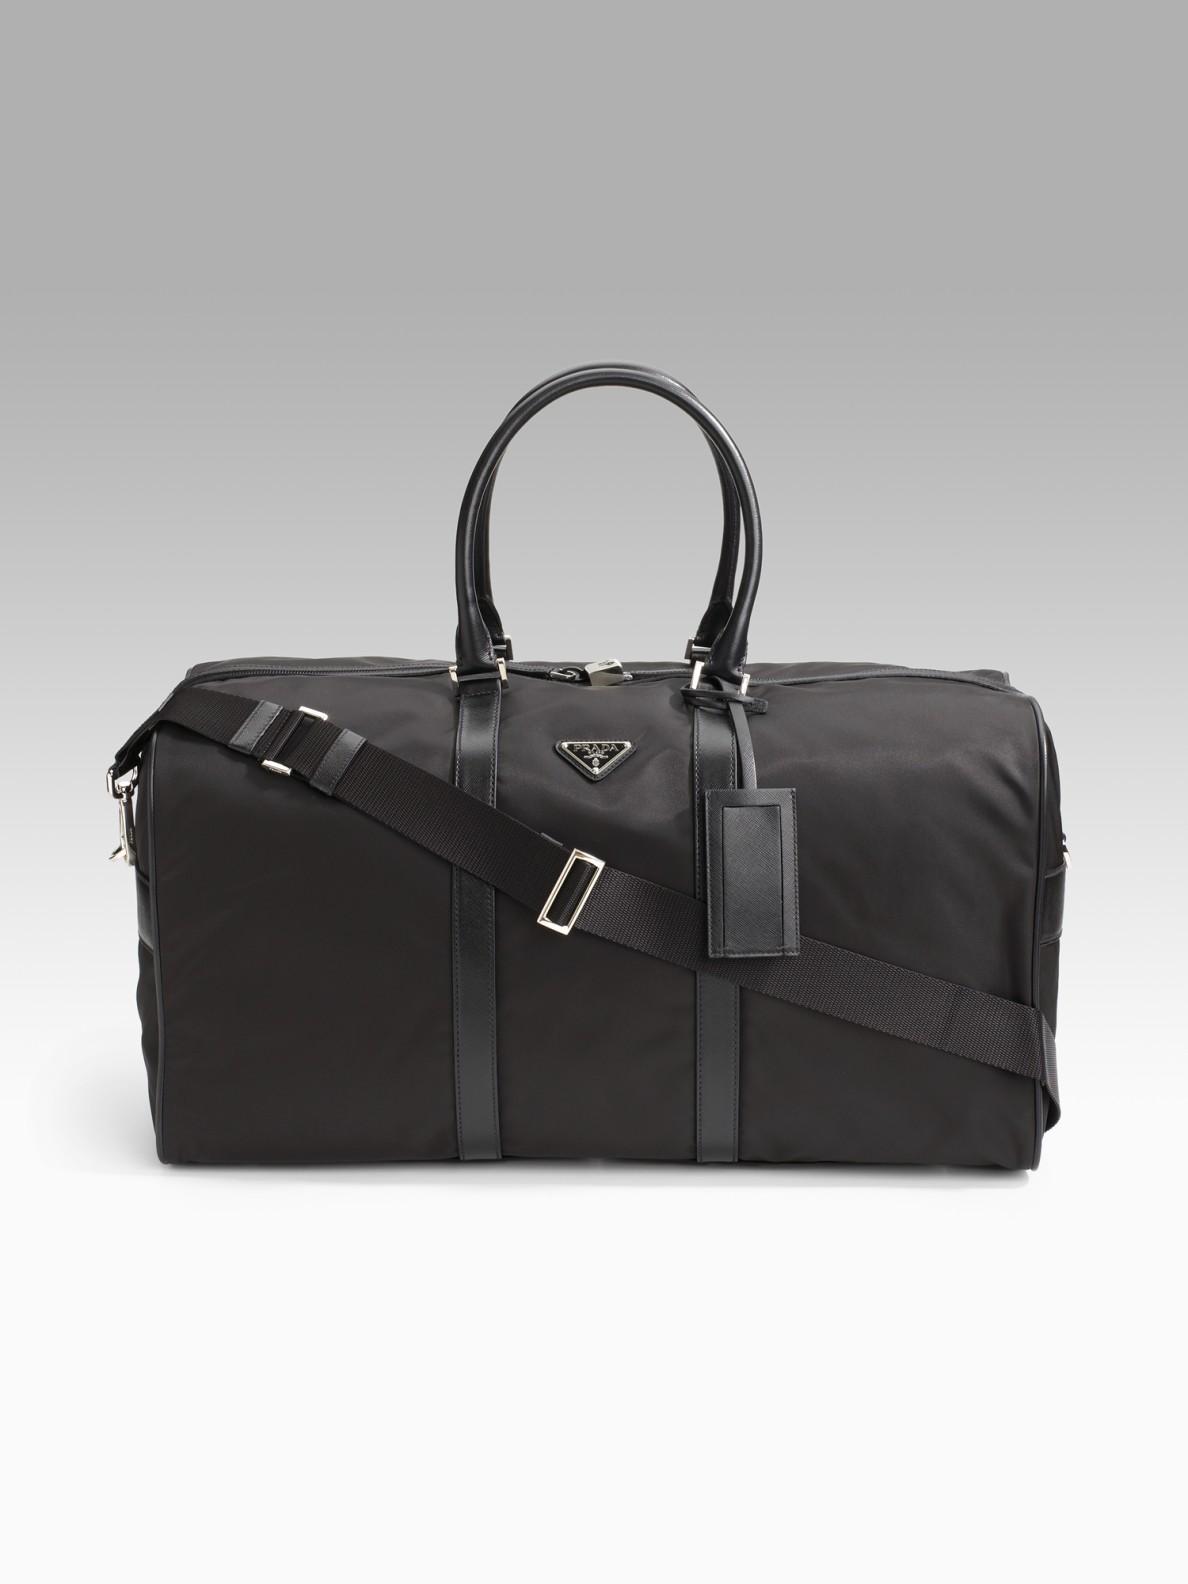 1ddc7b9eb90cba Prada Nylon Duffle Bag in Black for Men - Lyst